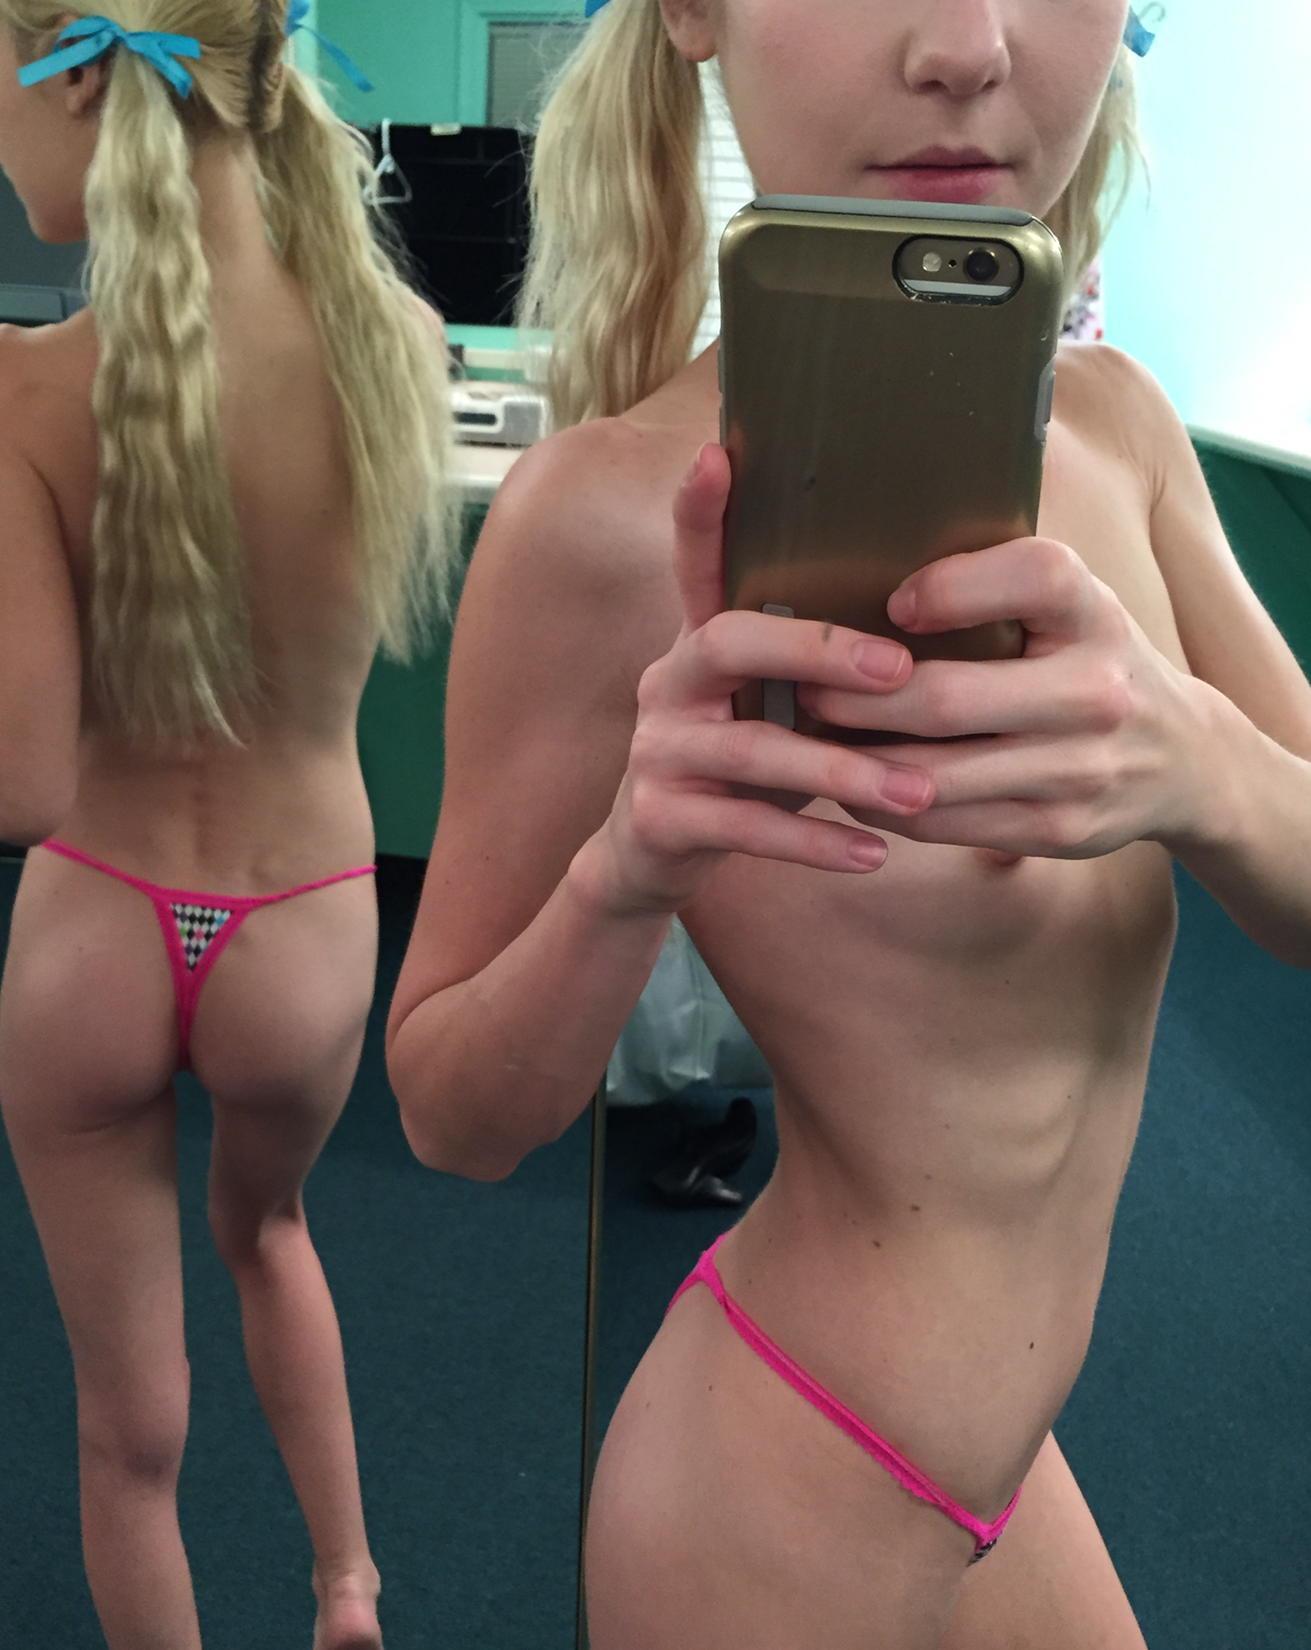 Odette Delacroix Porno Vidoes  Pornhubcom